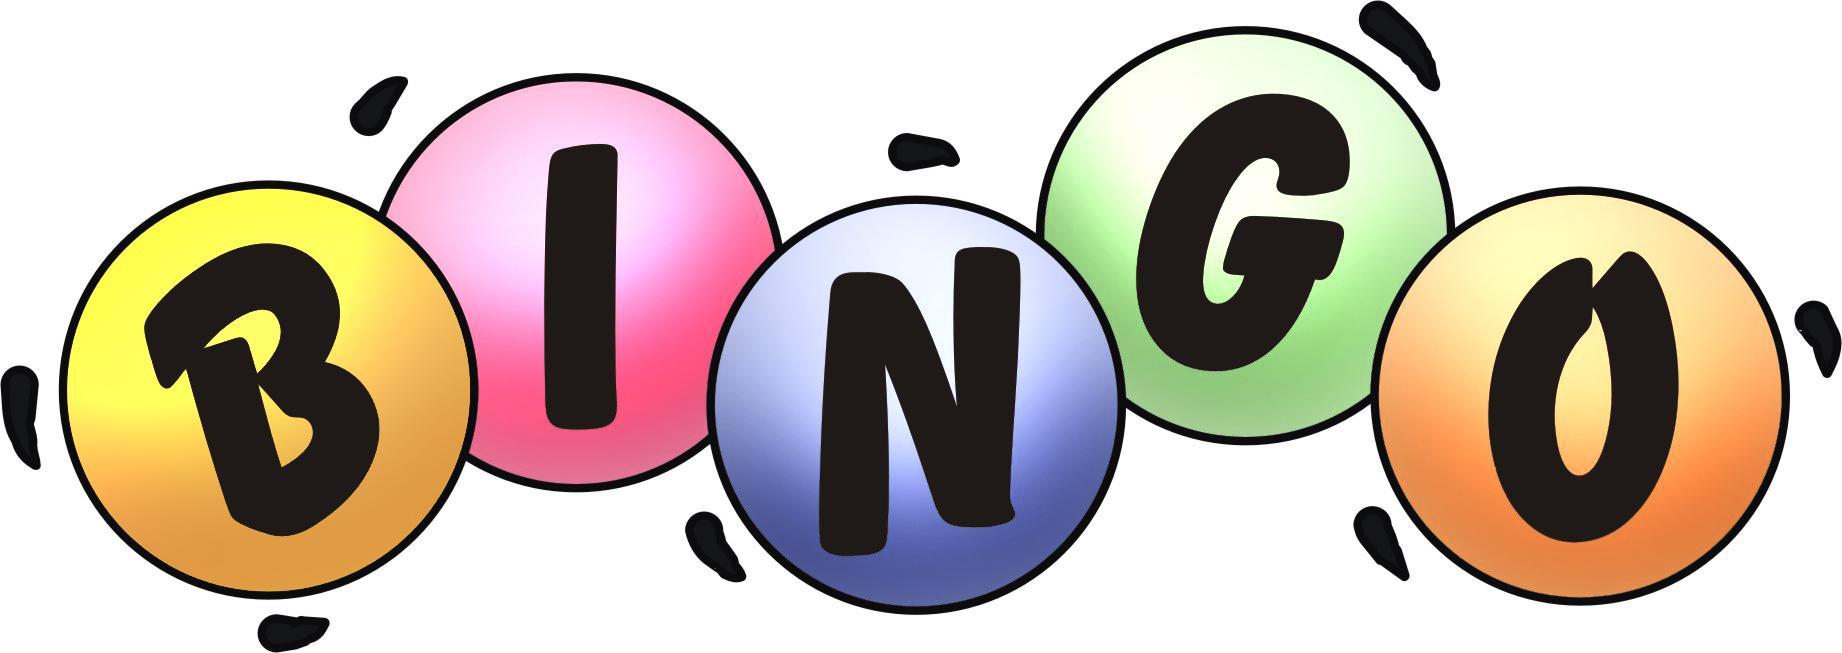 Free pictures clipartix. Bingo clipart merchandise